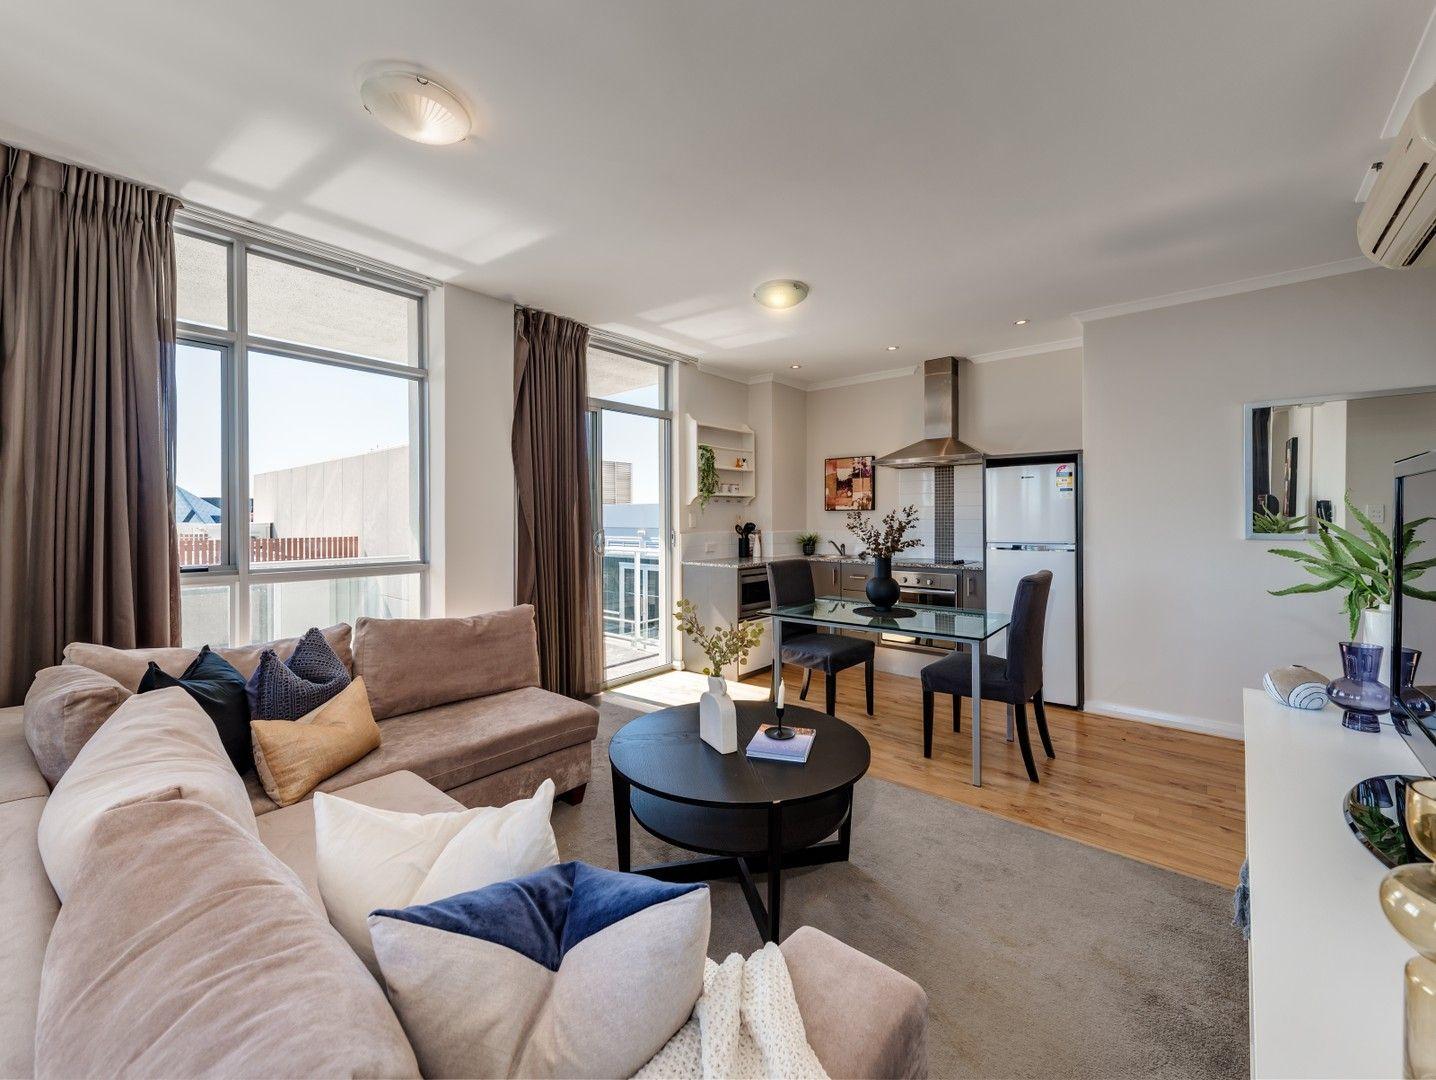 2 bedrooms Apartment / Unit / Flat in 25/996 Hay Street PERTH WA, 6000